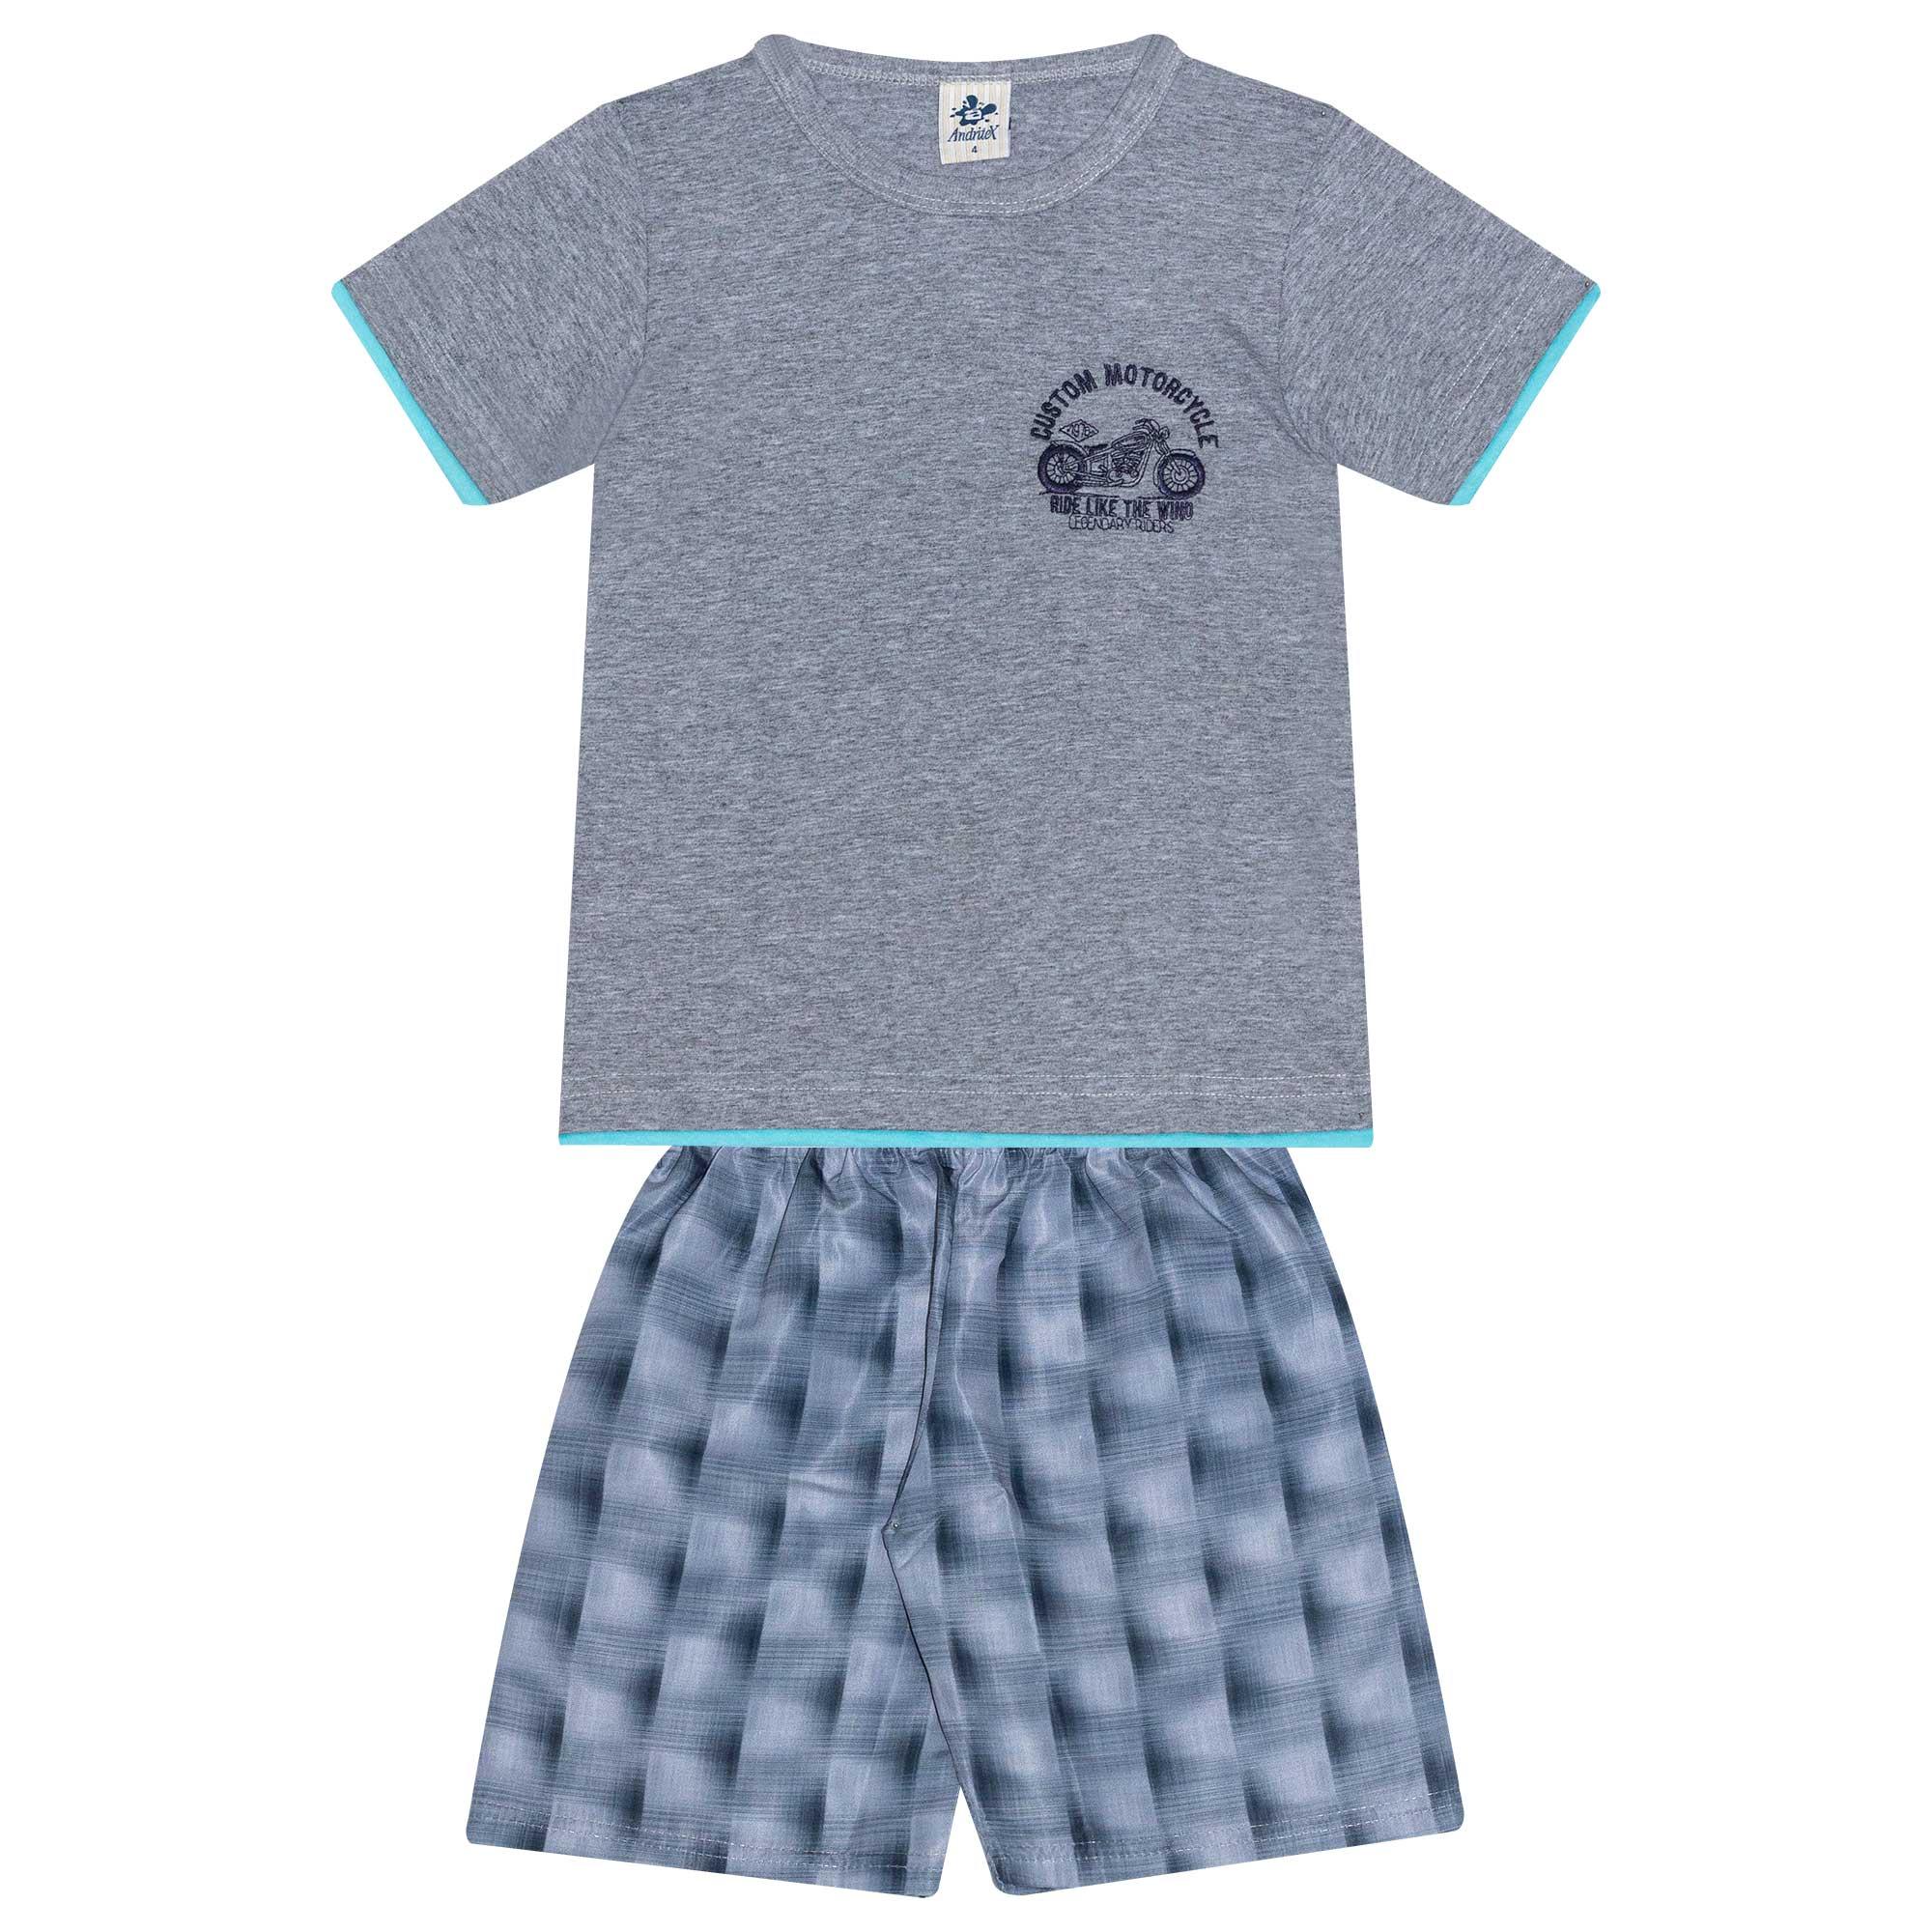 Conjunto Infantil Masculino - Ref 4778  - Mescla - Andritex